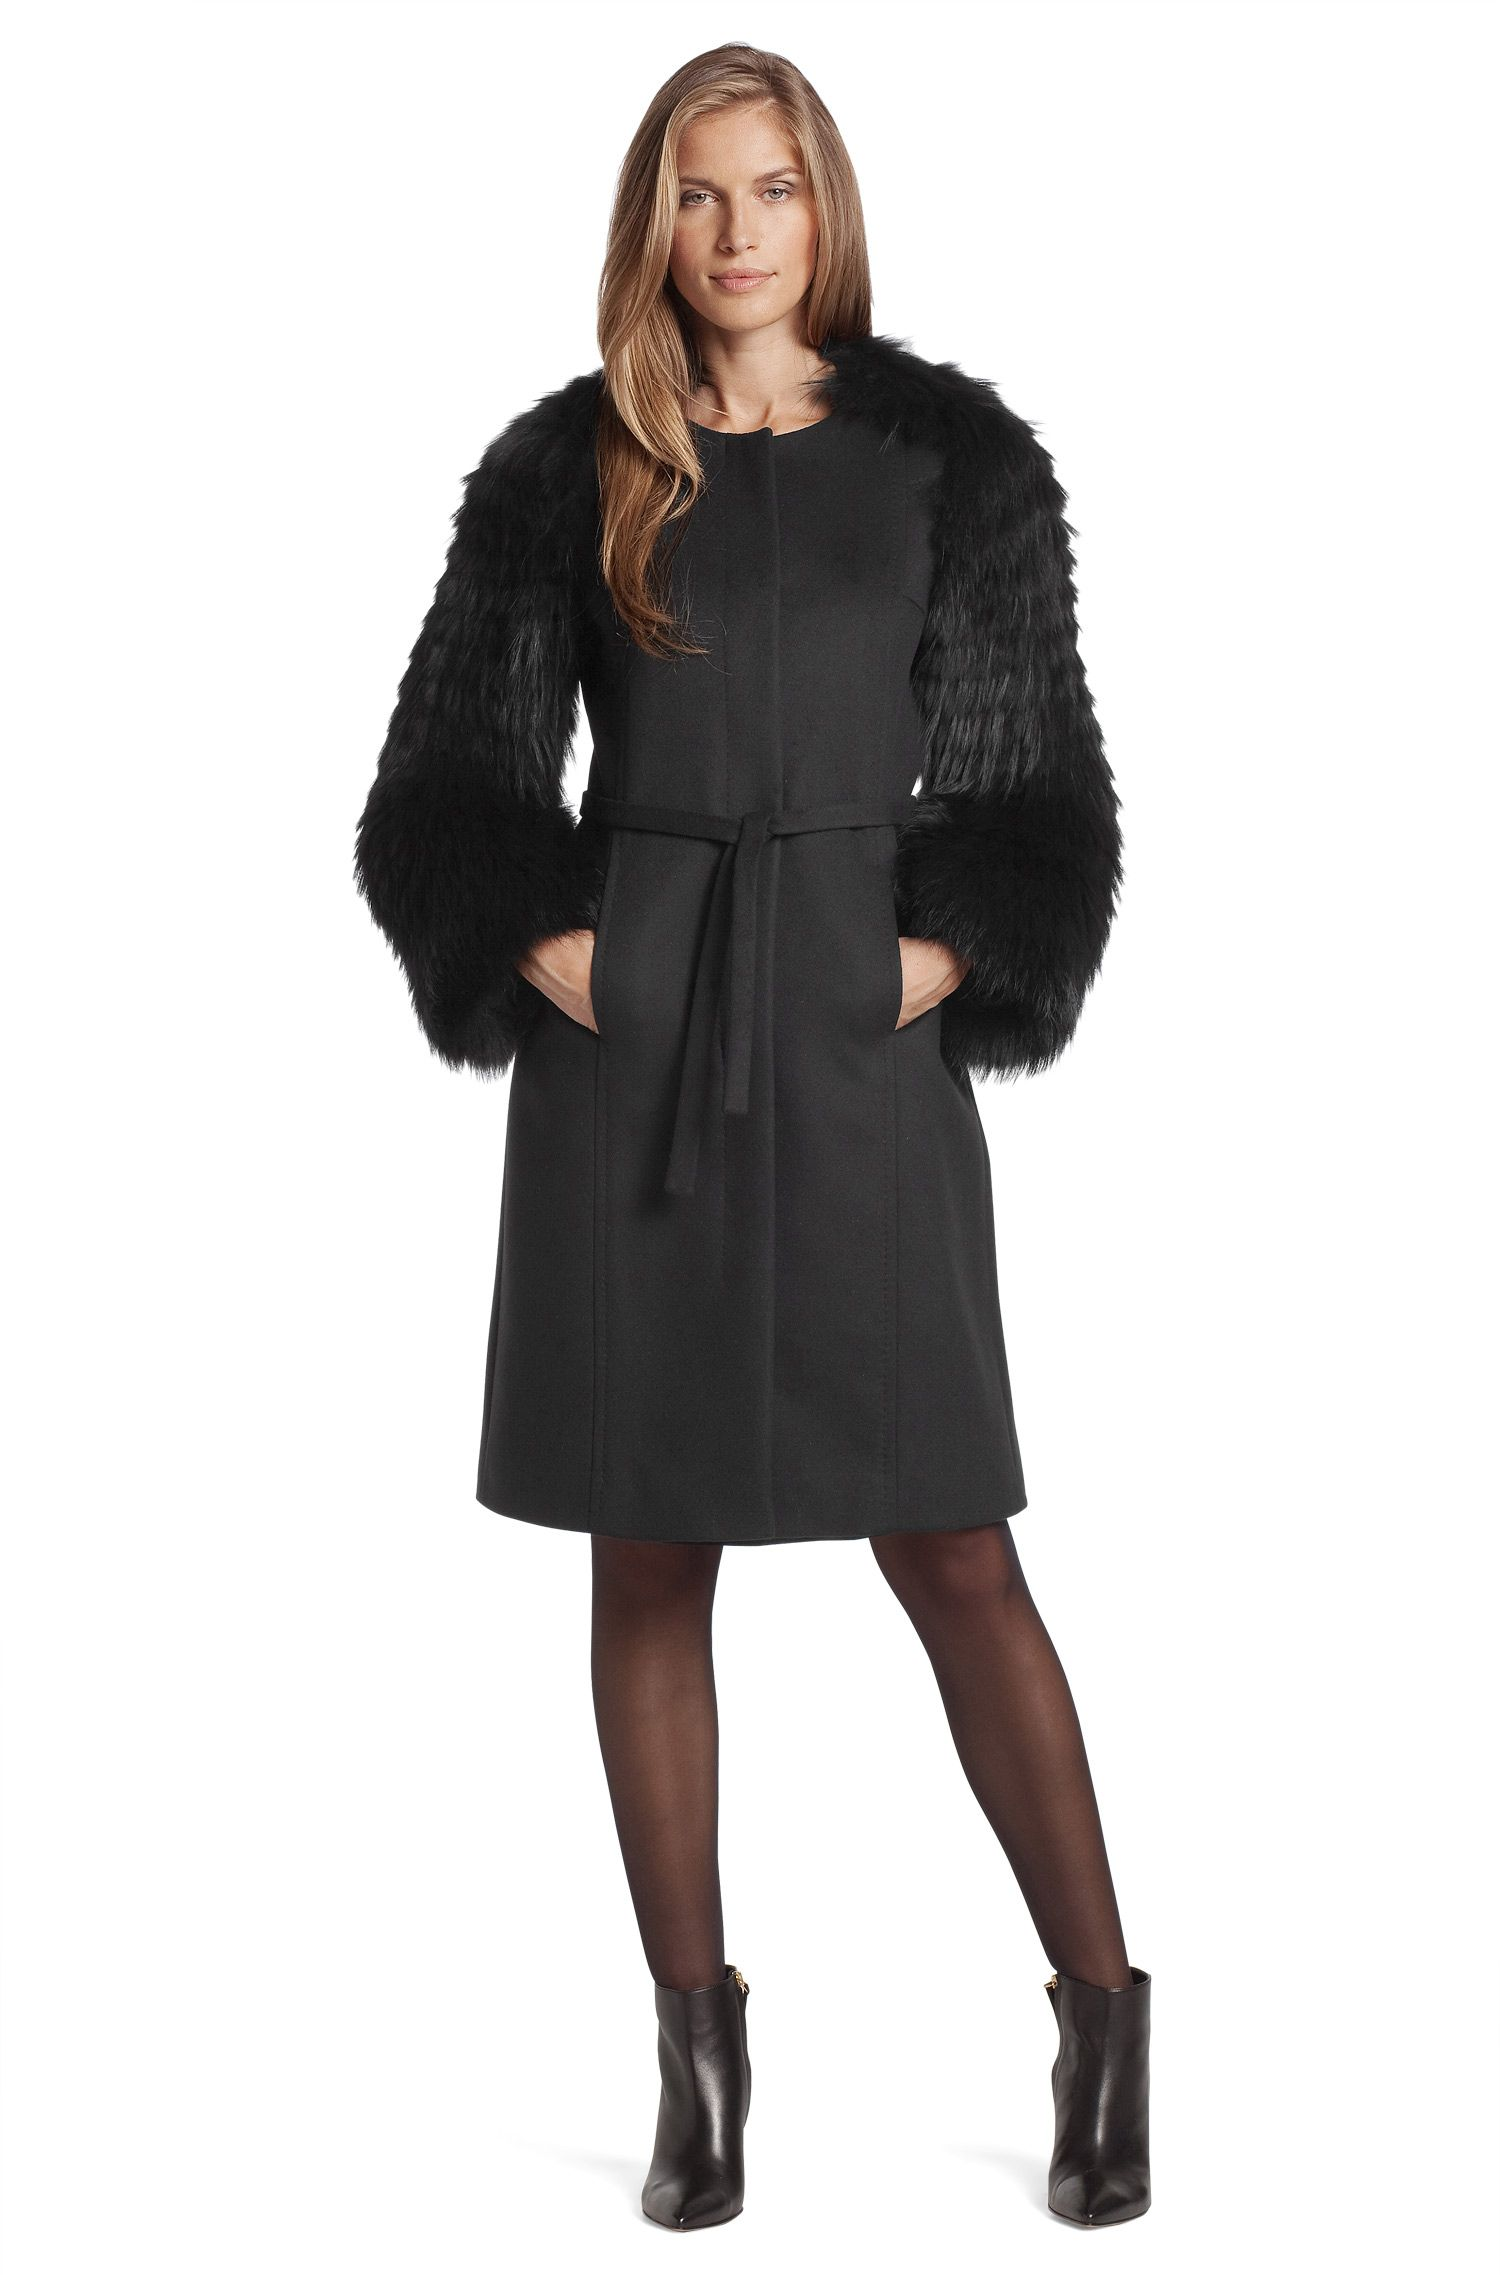 Mantel ´Cesna` mit Ärmeln aus Waschbär-Fell